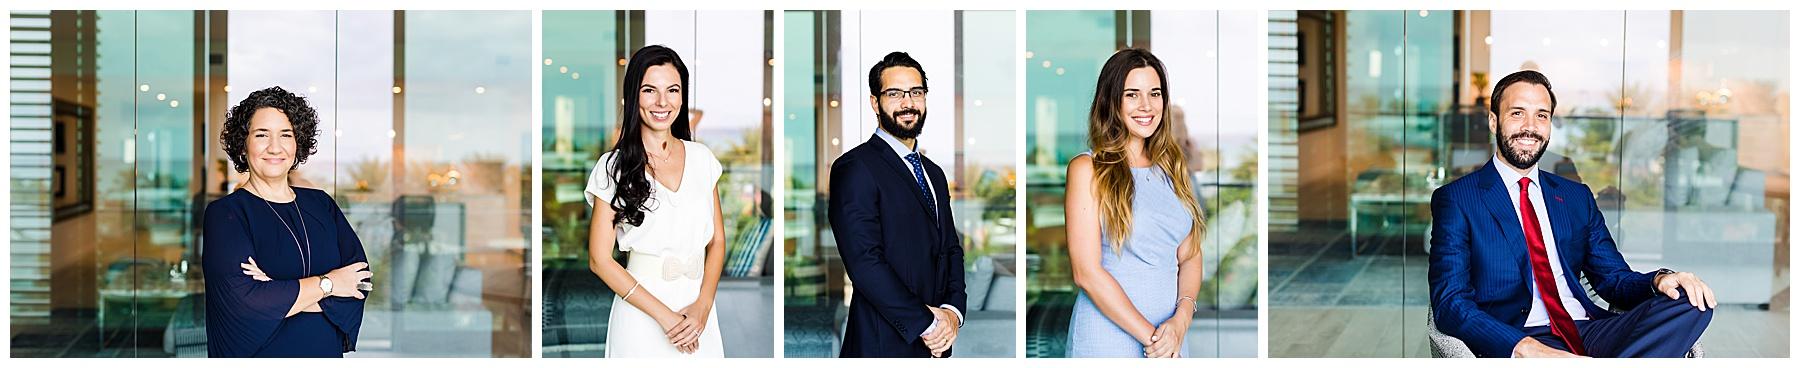 Lisa Reid hotography Corporate Portraits Grand Cayman